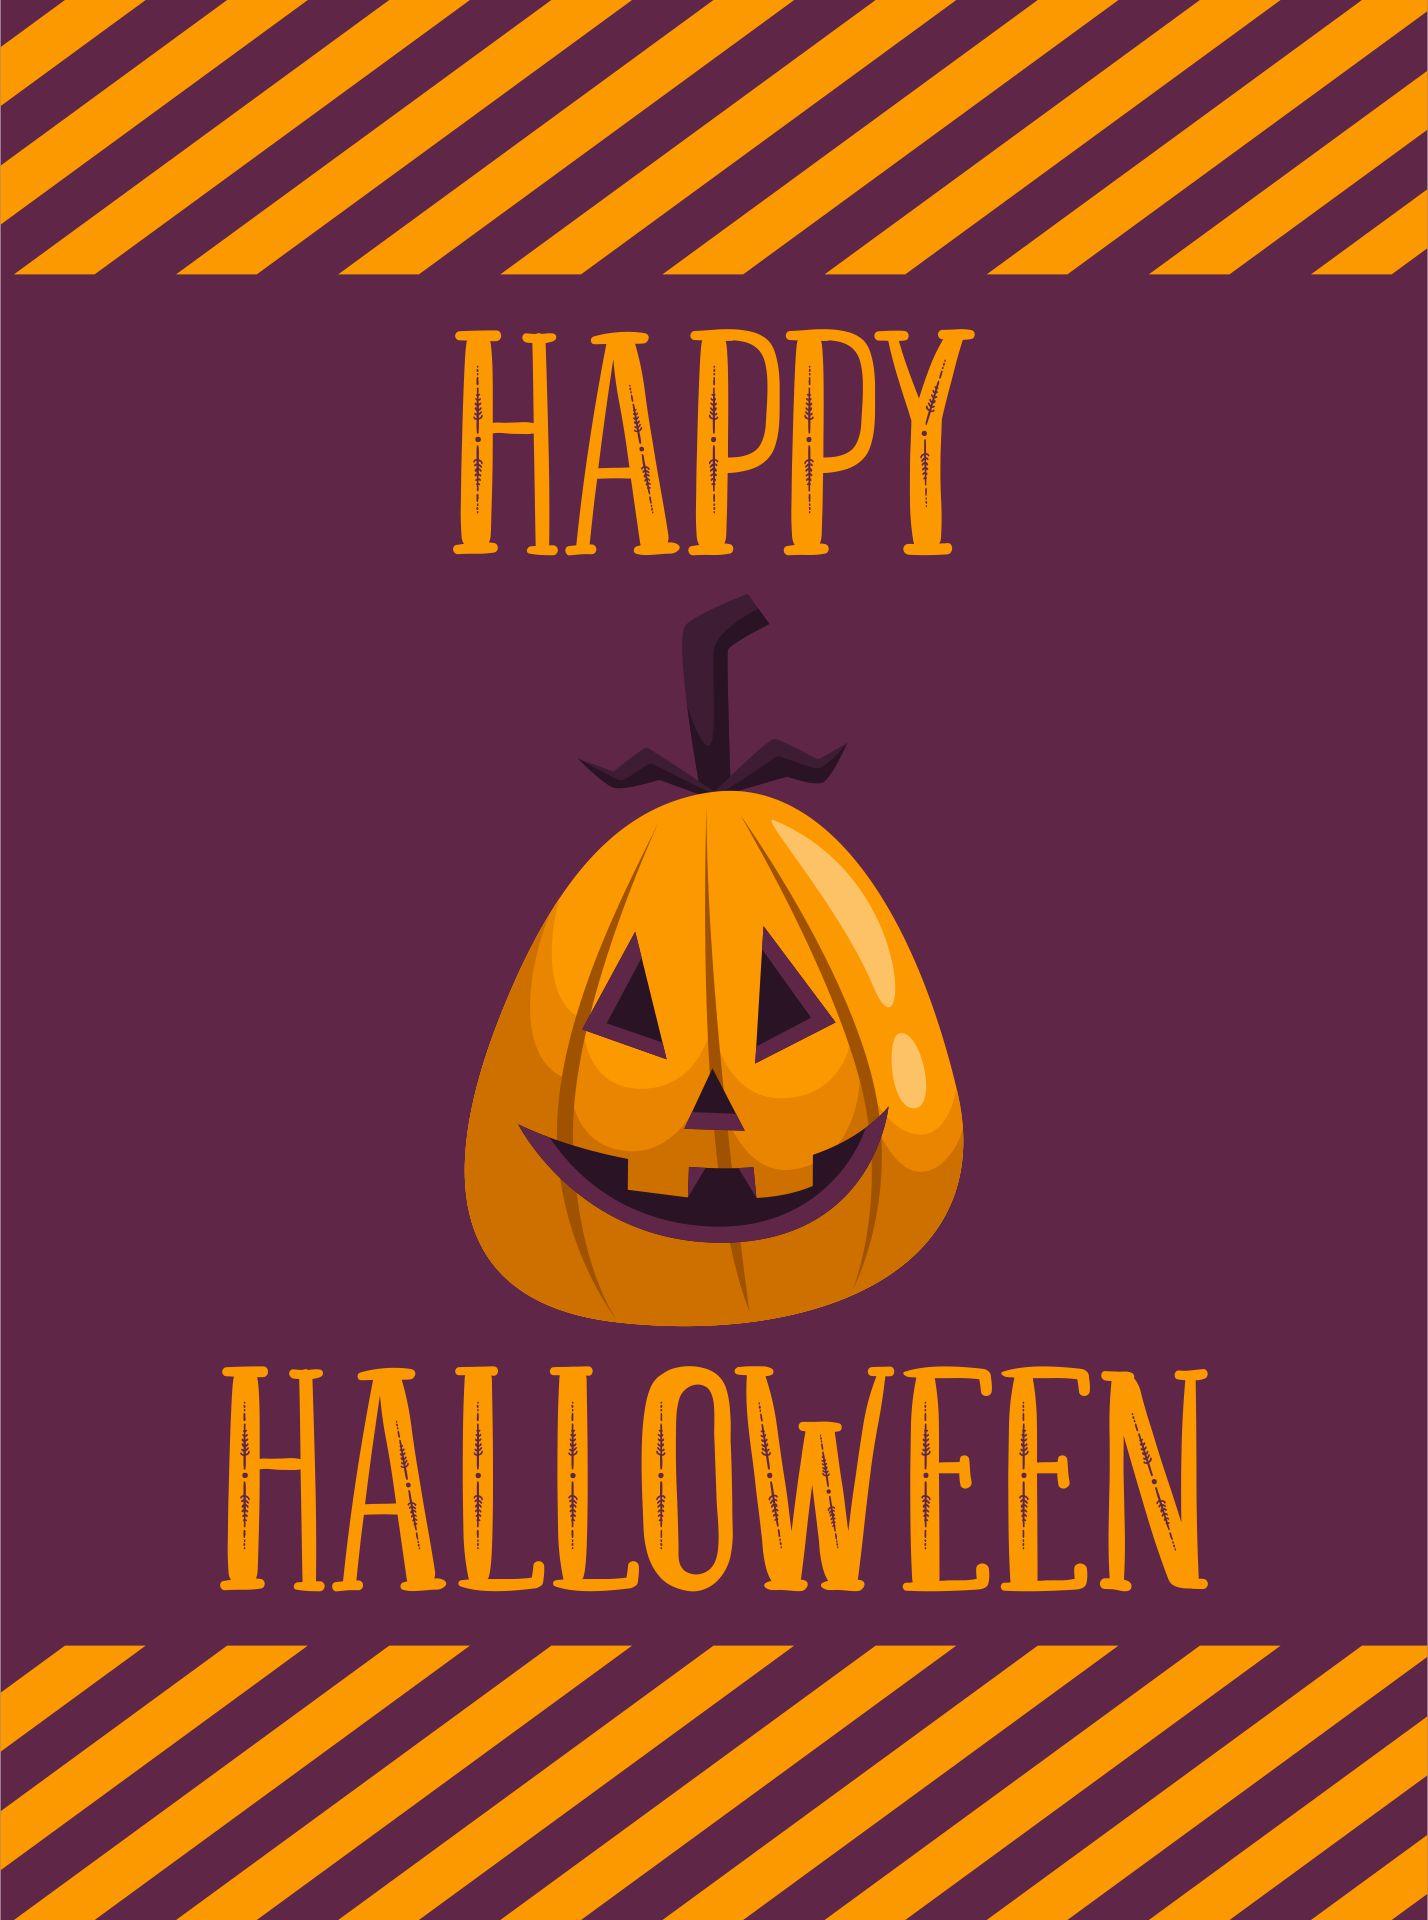 Halloween Greeting Card With Jack-O-Lantern